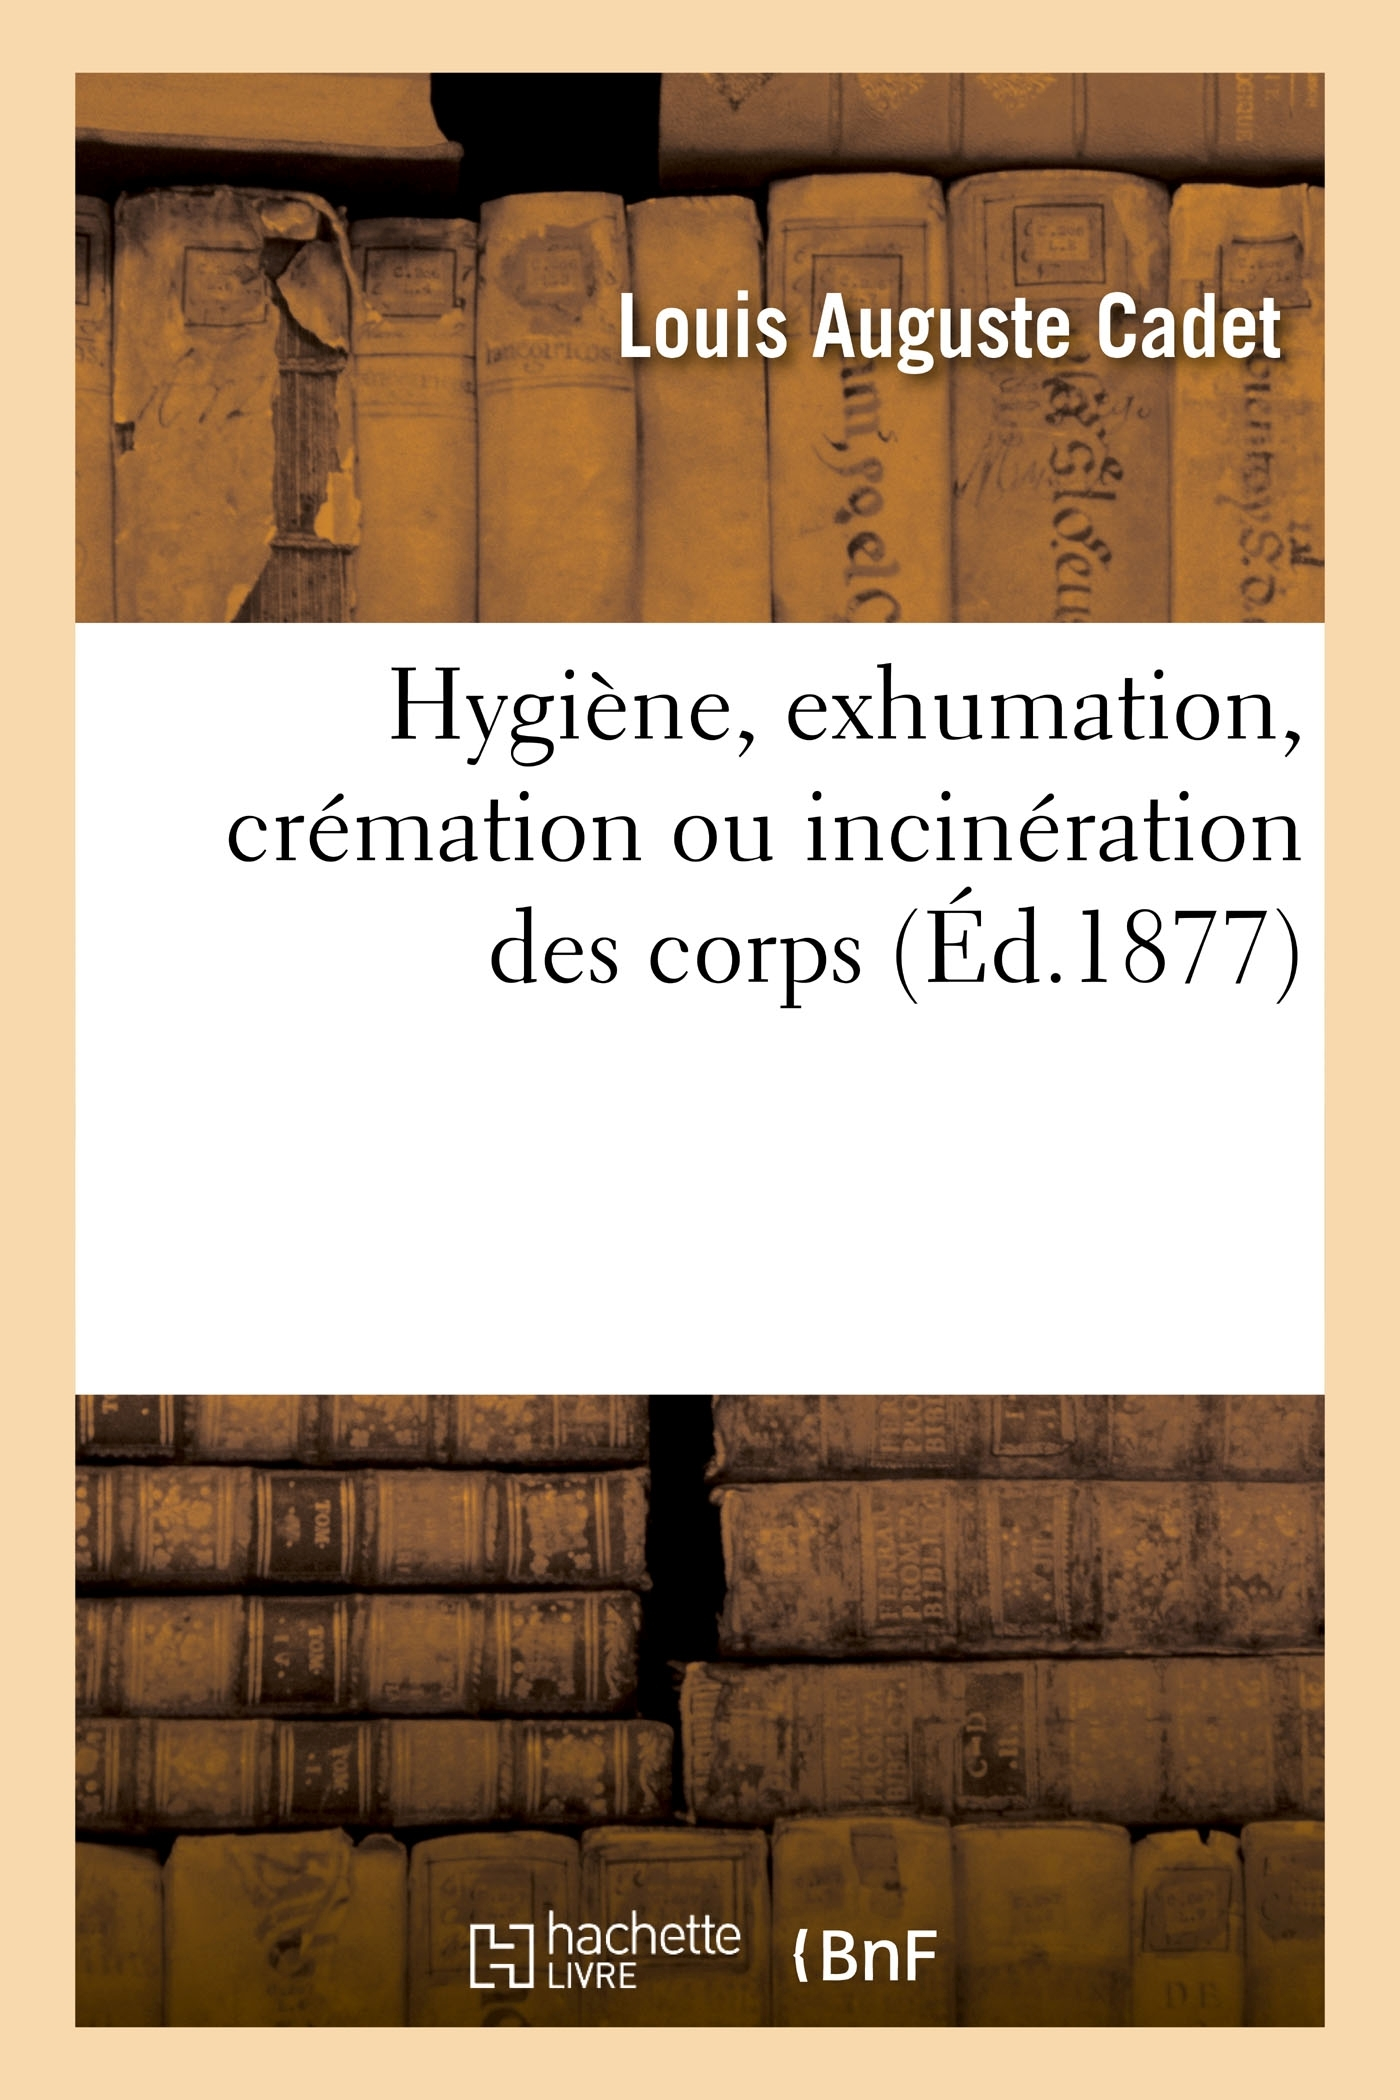 HYGIENE, EXHUMATION, CREMATION OU INCINERATION DES CORPS